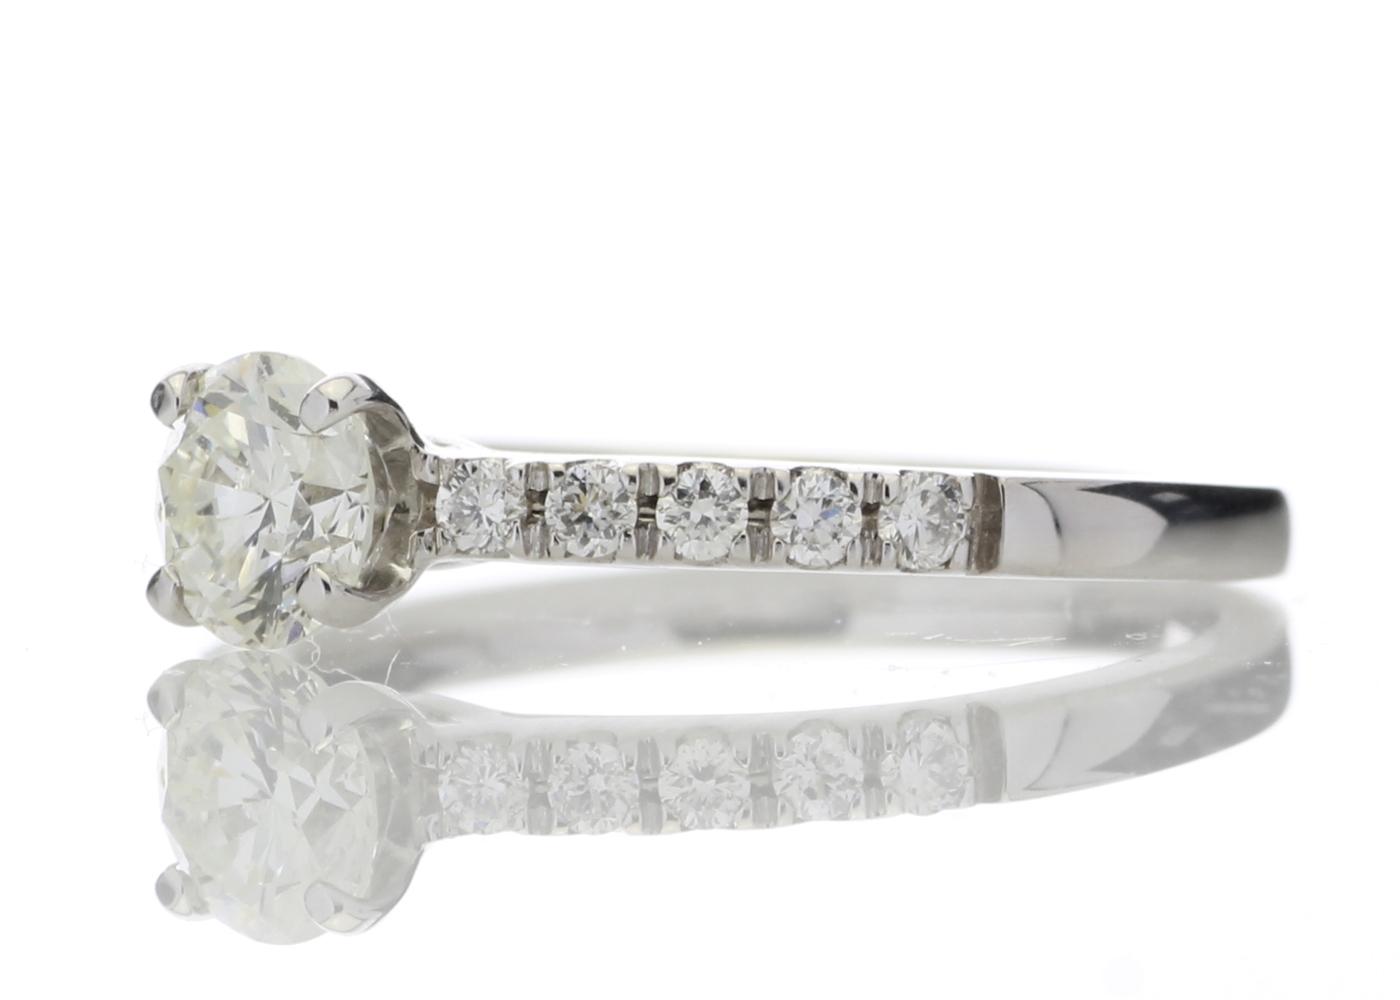 18ct Stone Set Shoulders Diamond Ring 0.69 Carats - Image 2 of 5